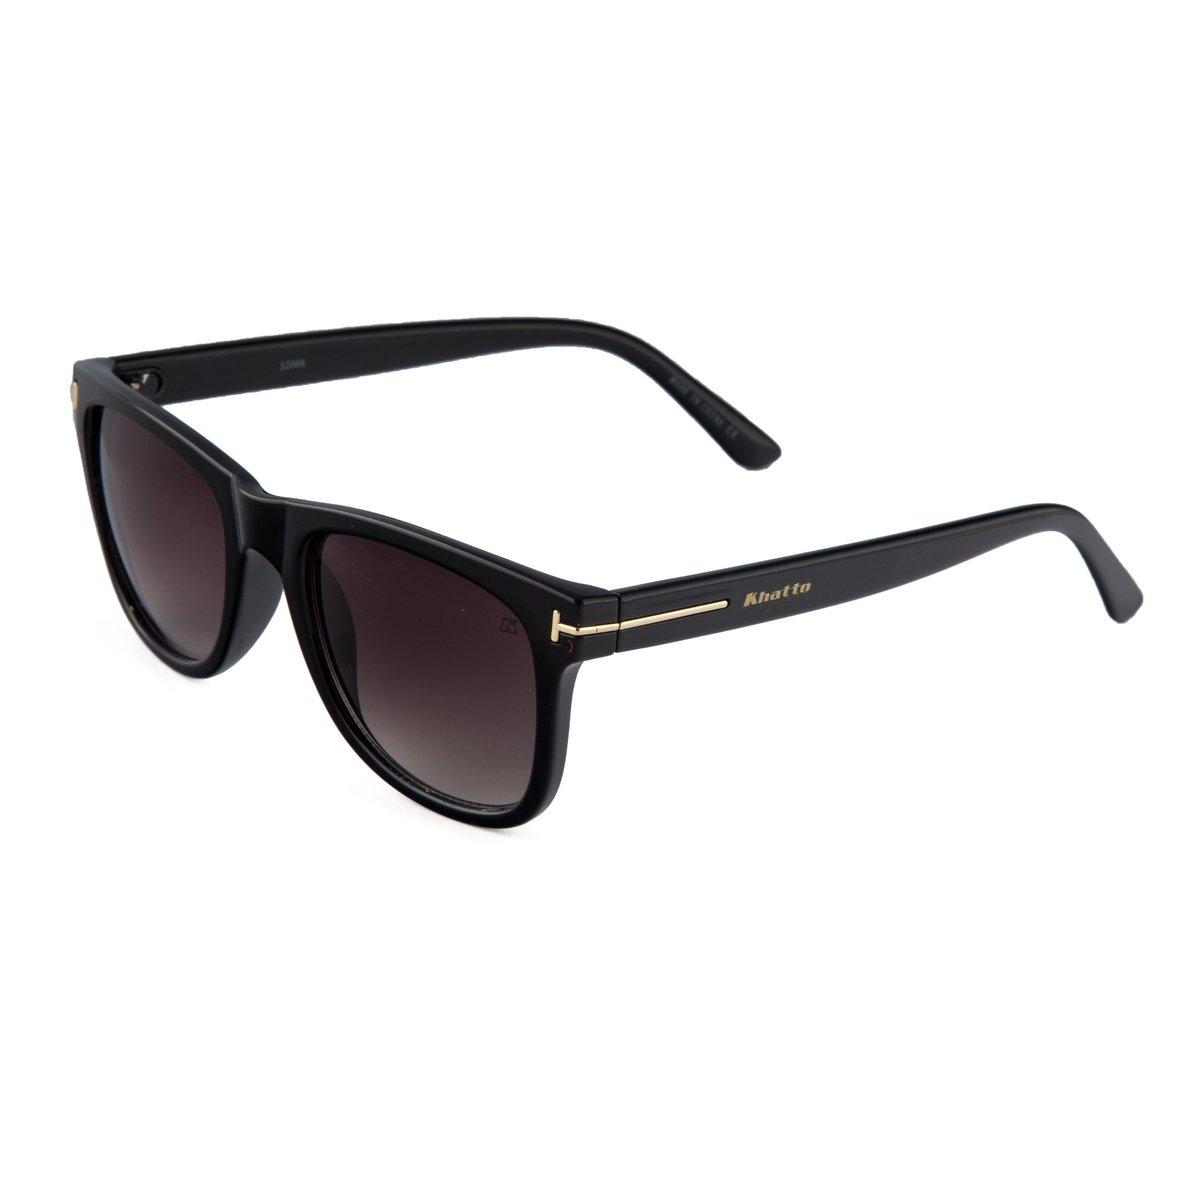 a763d19af Óculos de Sol Khatto 32066 - Compre Agora | Zattini